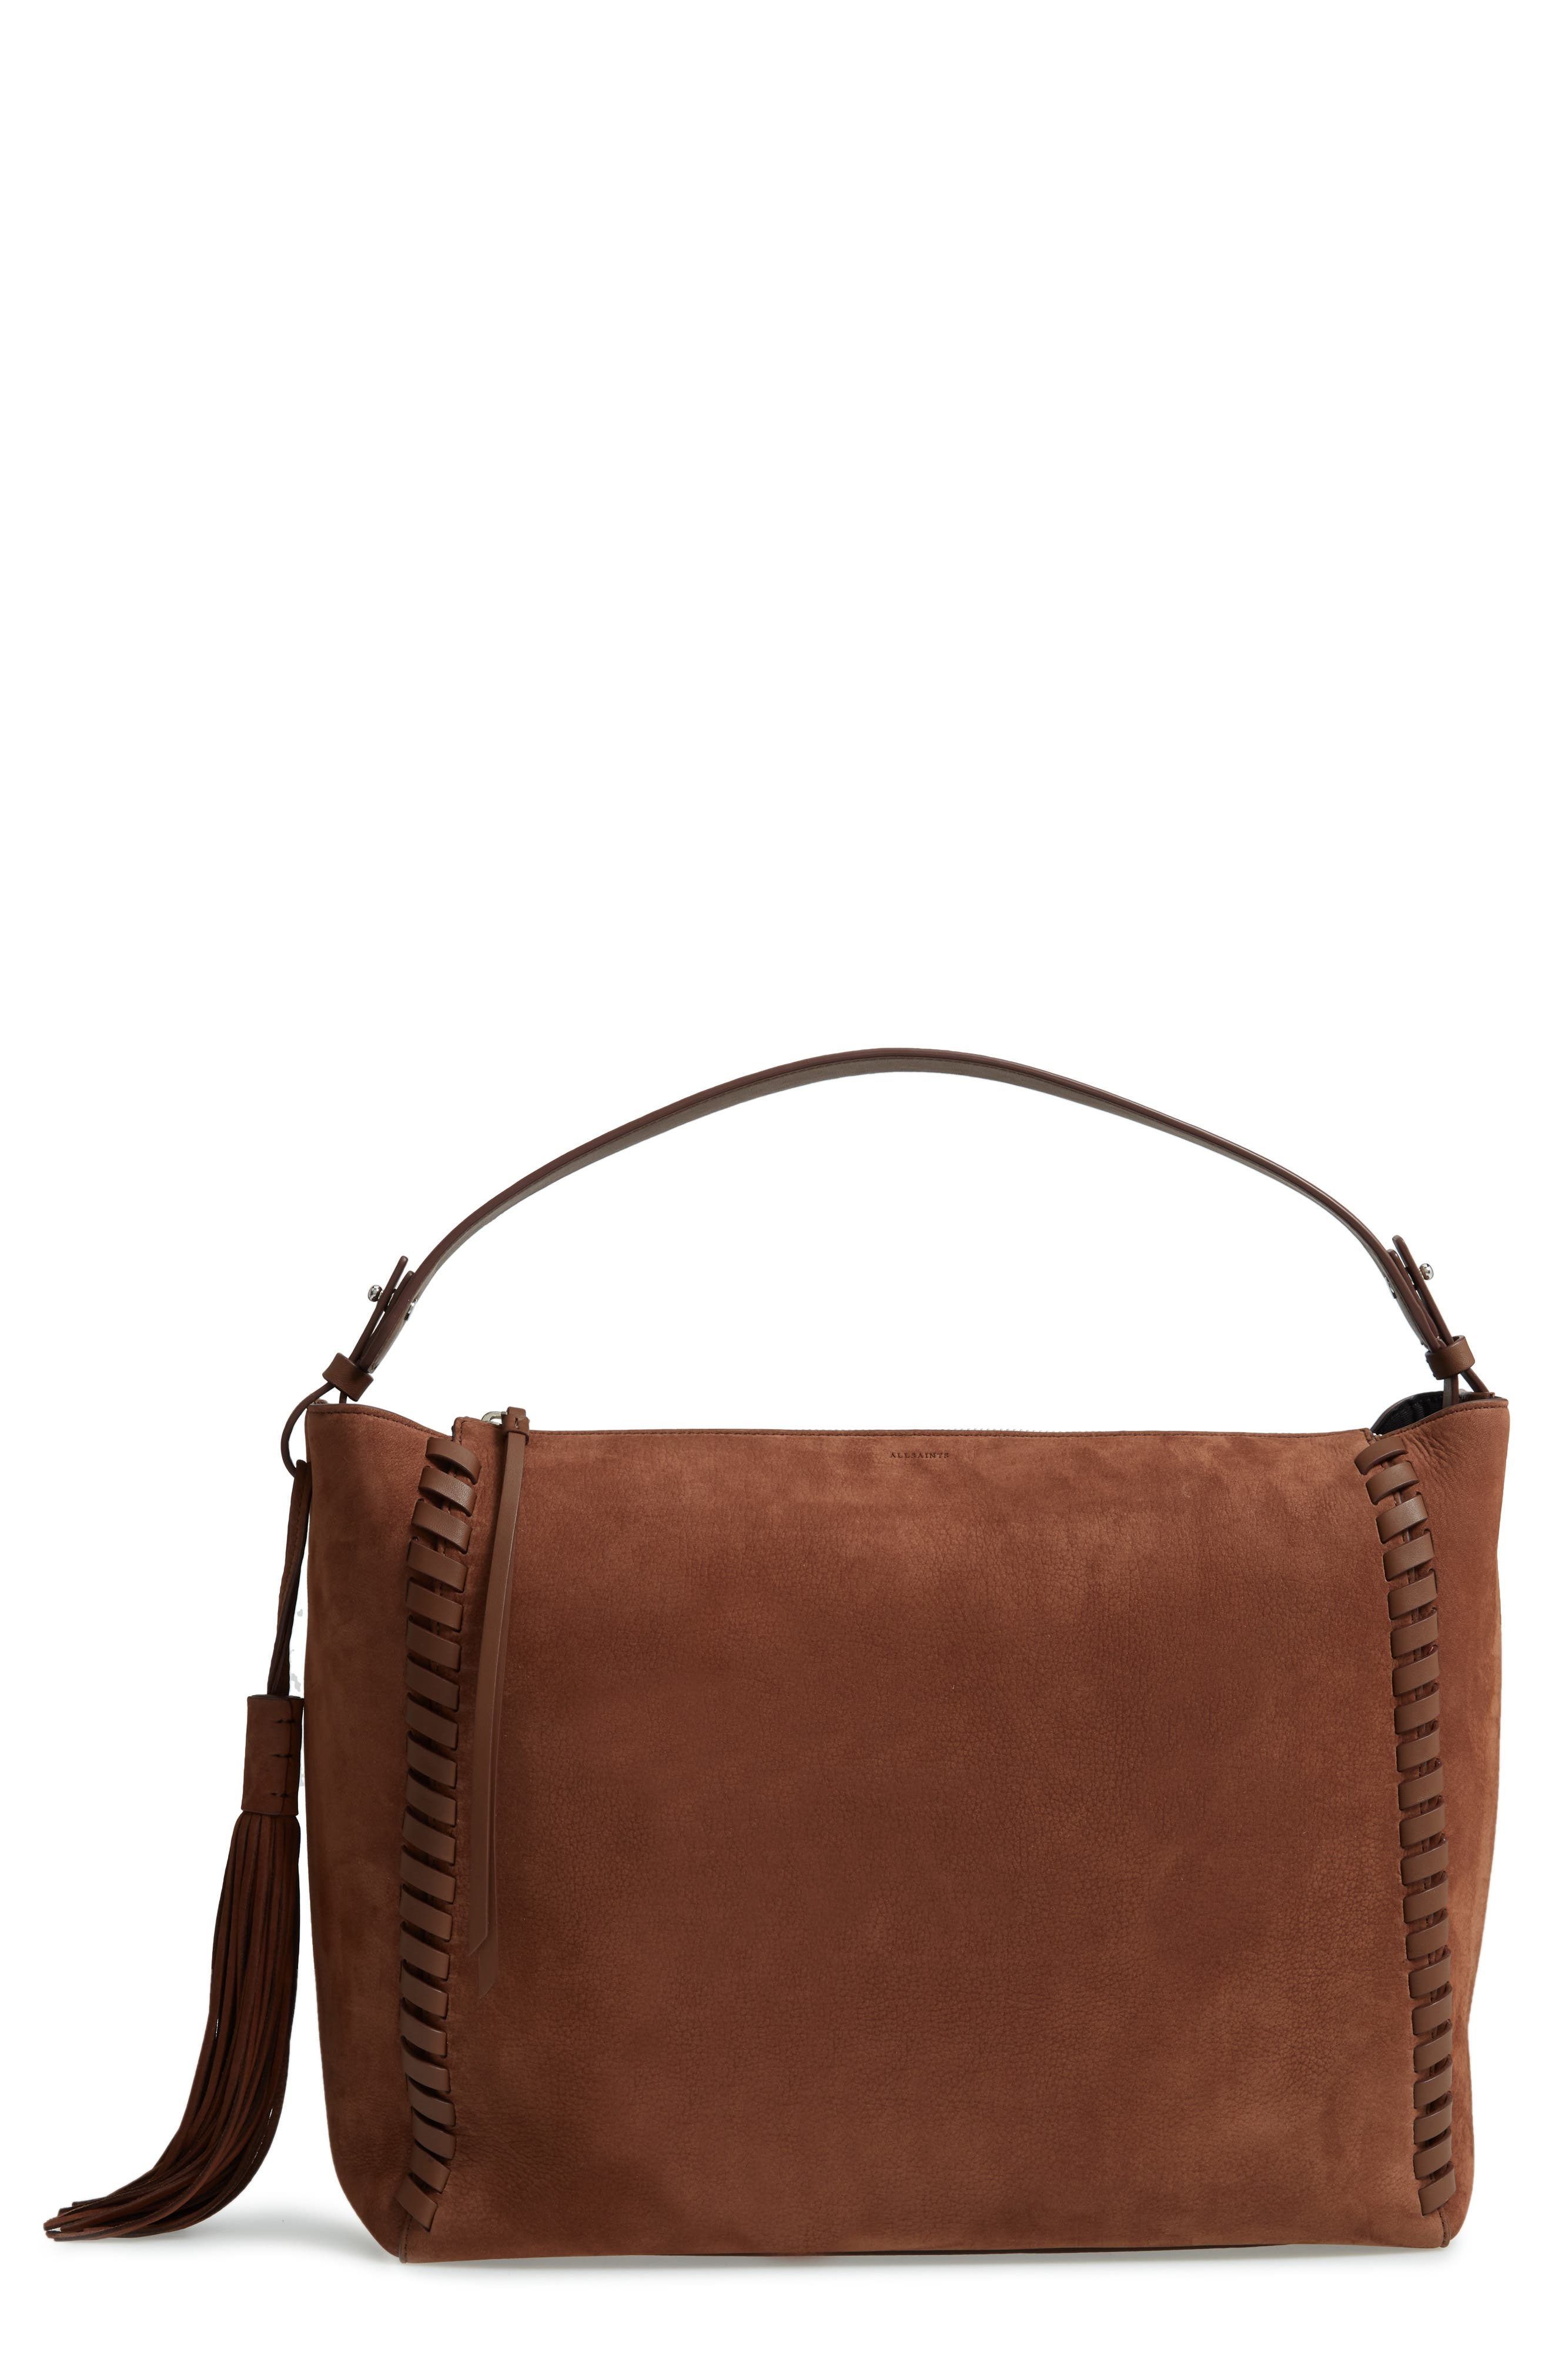 Kepi East/West Leather Shoulder Bag,                             Main thumbnail 1, color,                             Coffee Brown